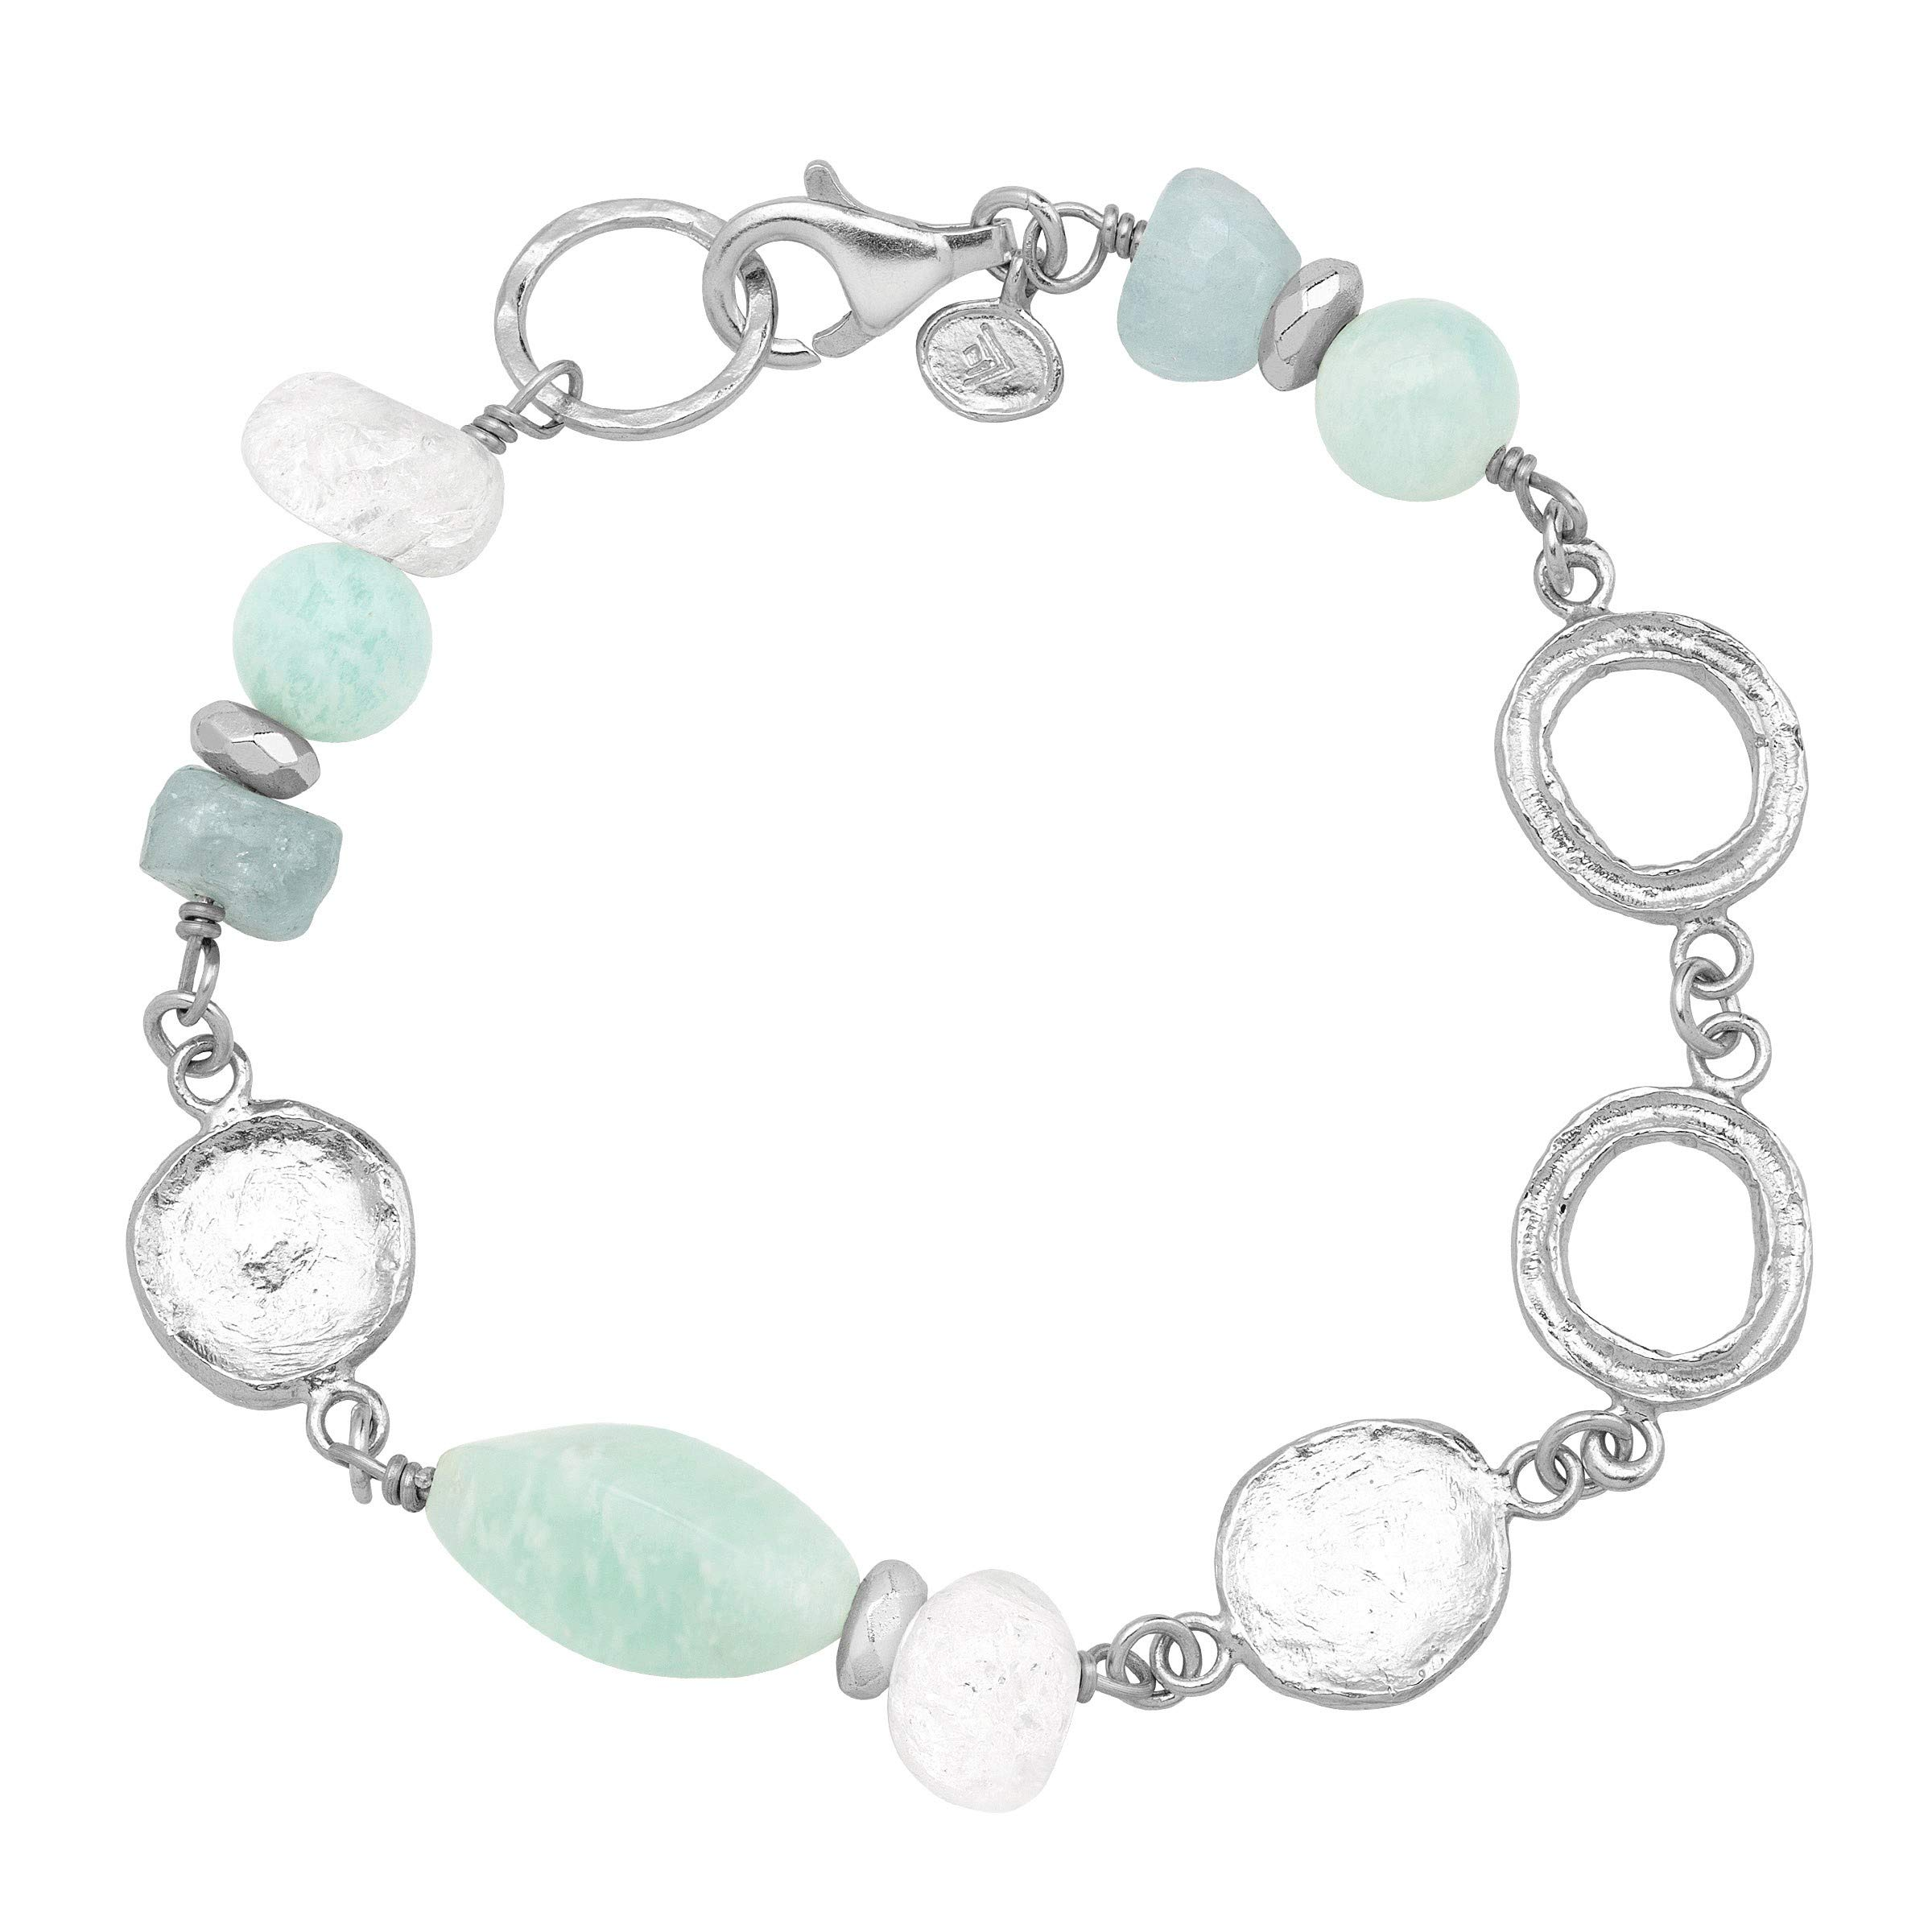 Silpada 'Boardwalk' Natural Aquamarine Link Bead Bracelet in Sterling Silver, 7.5''